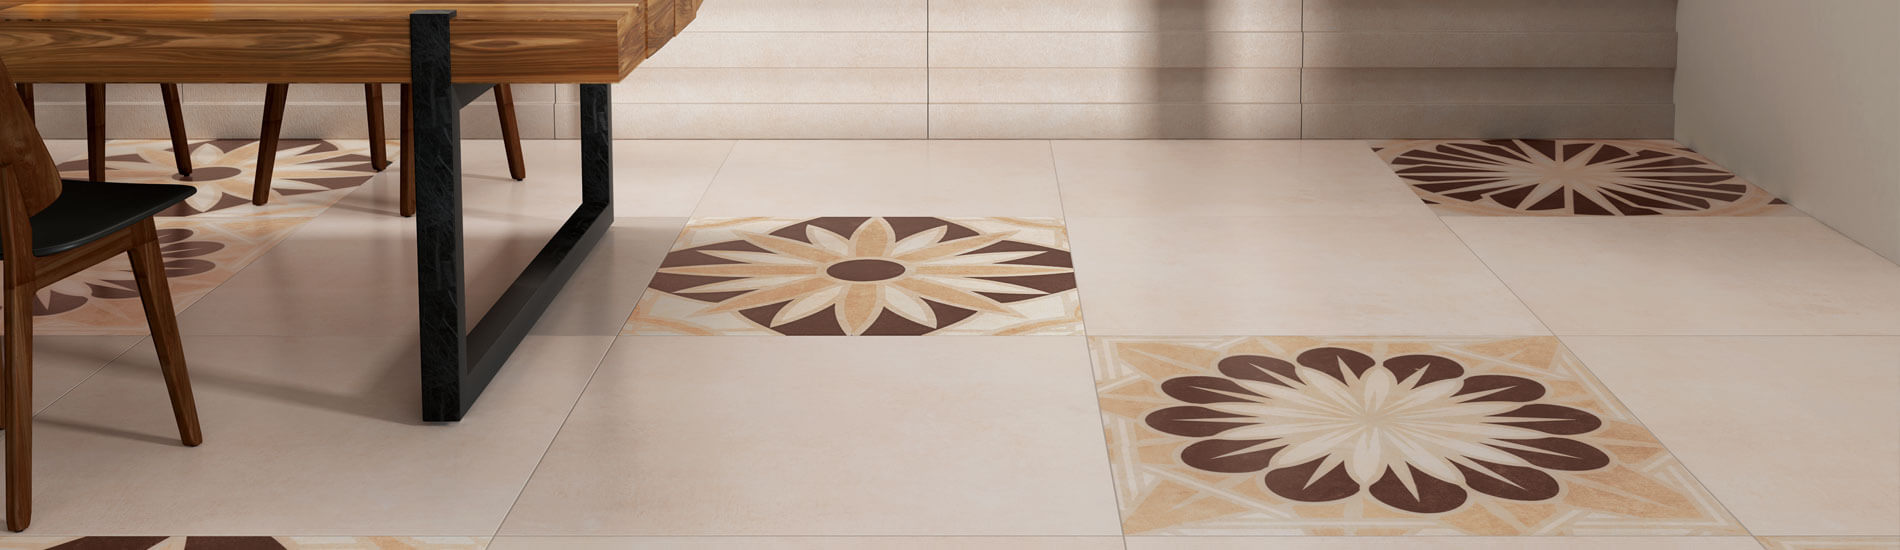 marjan Ceramic model verona 0 - کاشی مرجان مدل ورونا -  - tile-60-60, wall-tiles, bathroom-tiles, ceramic-floor-tiles